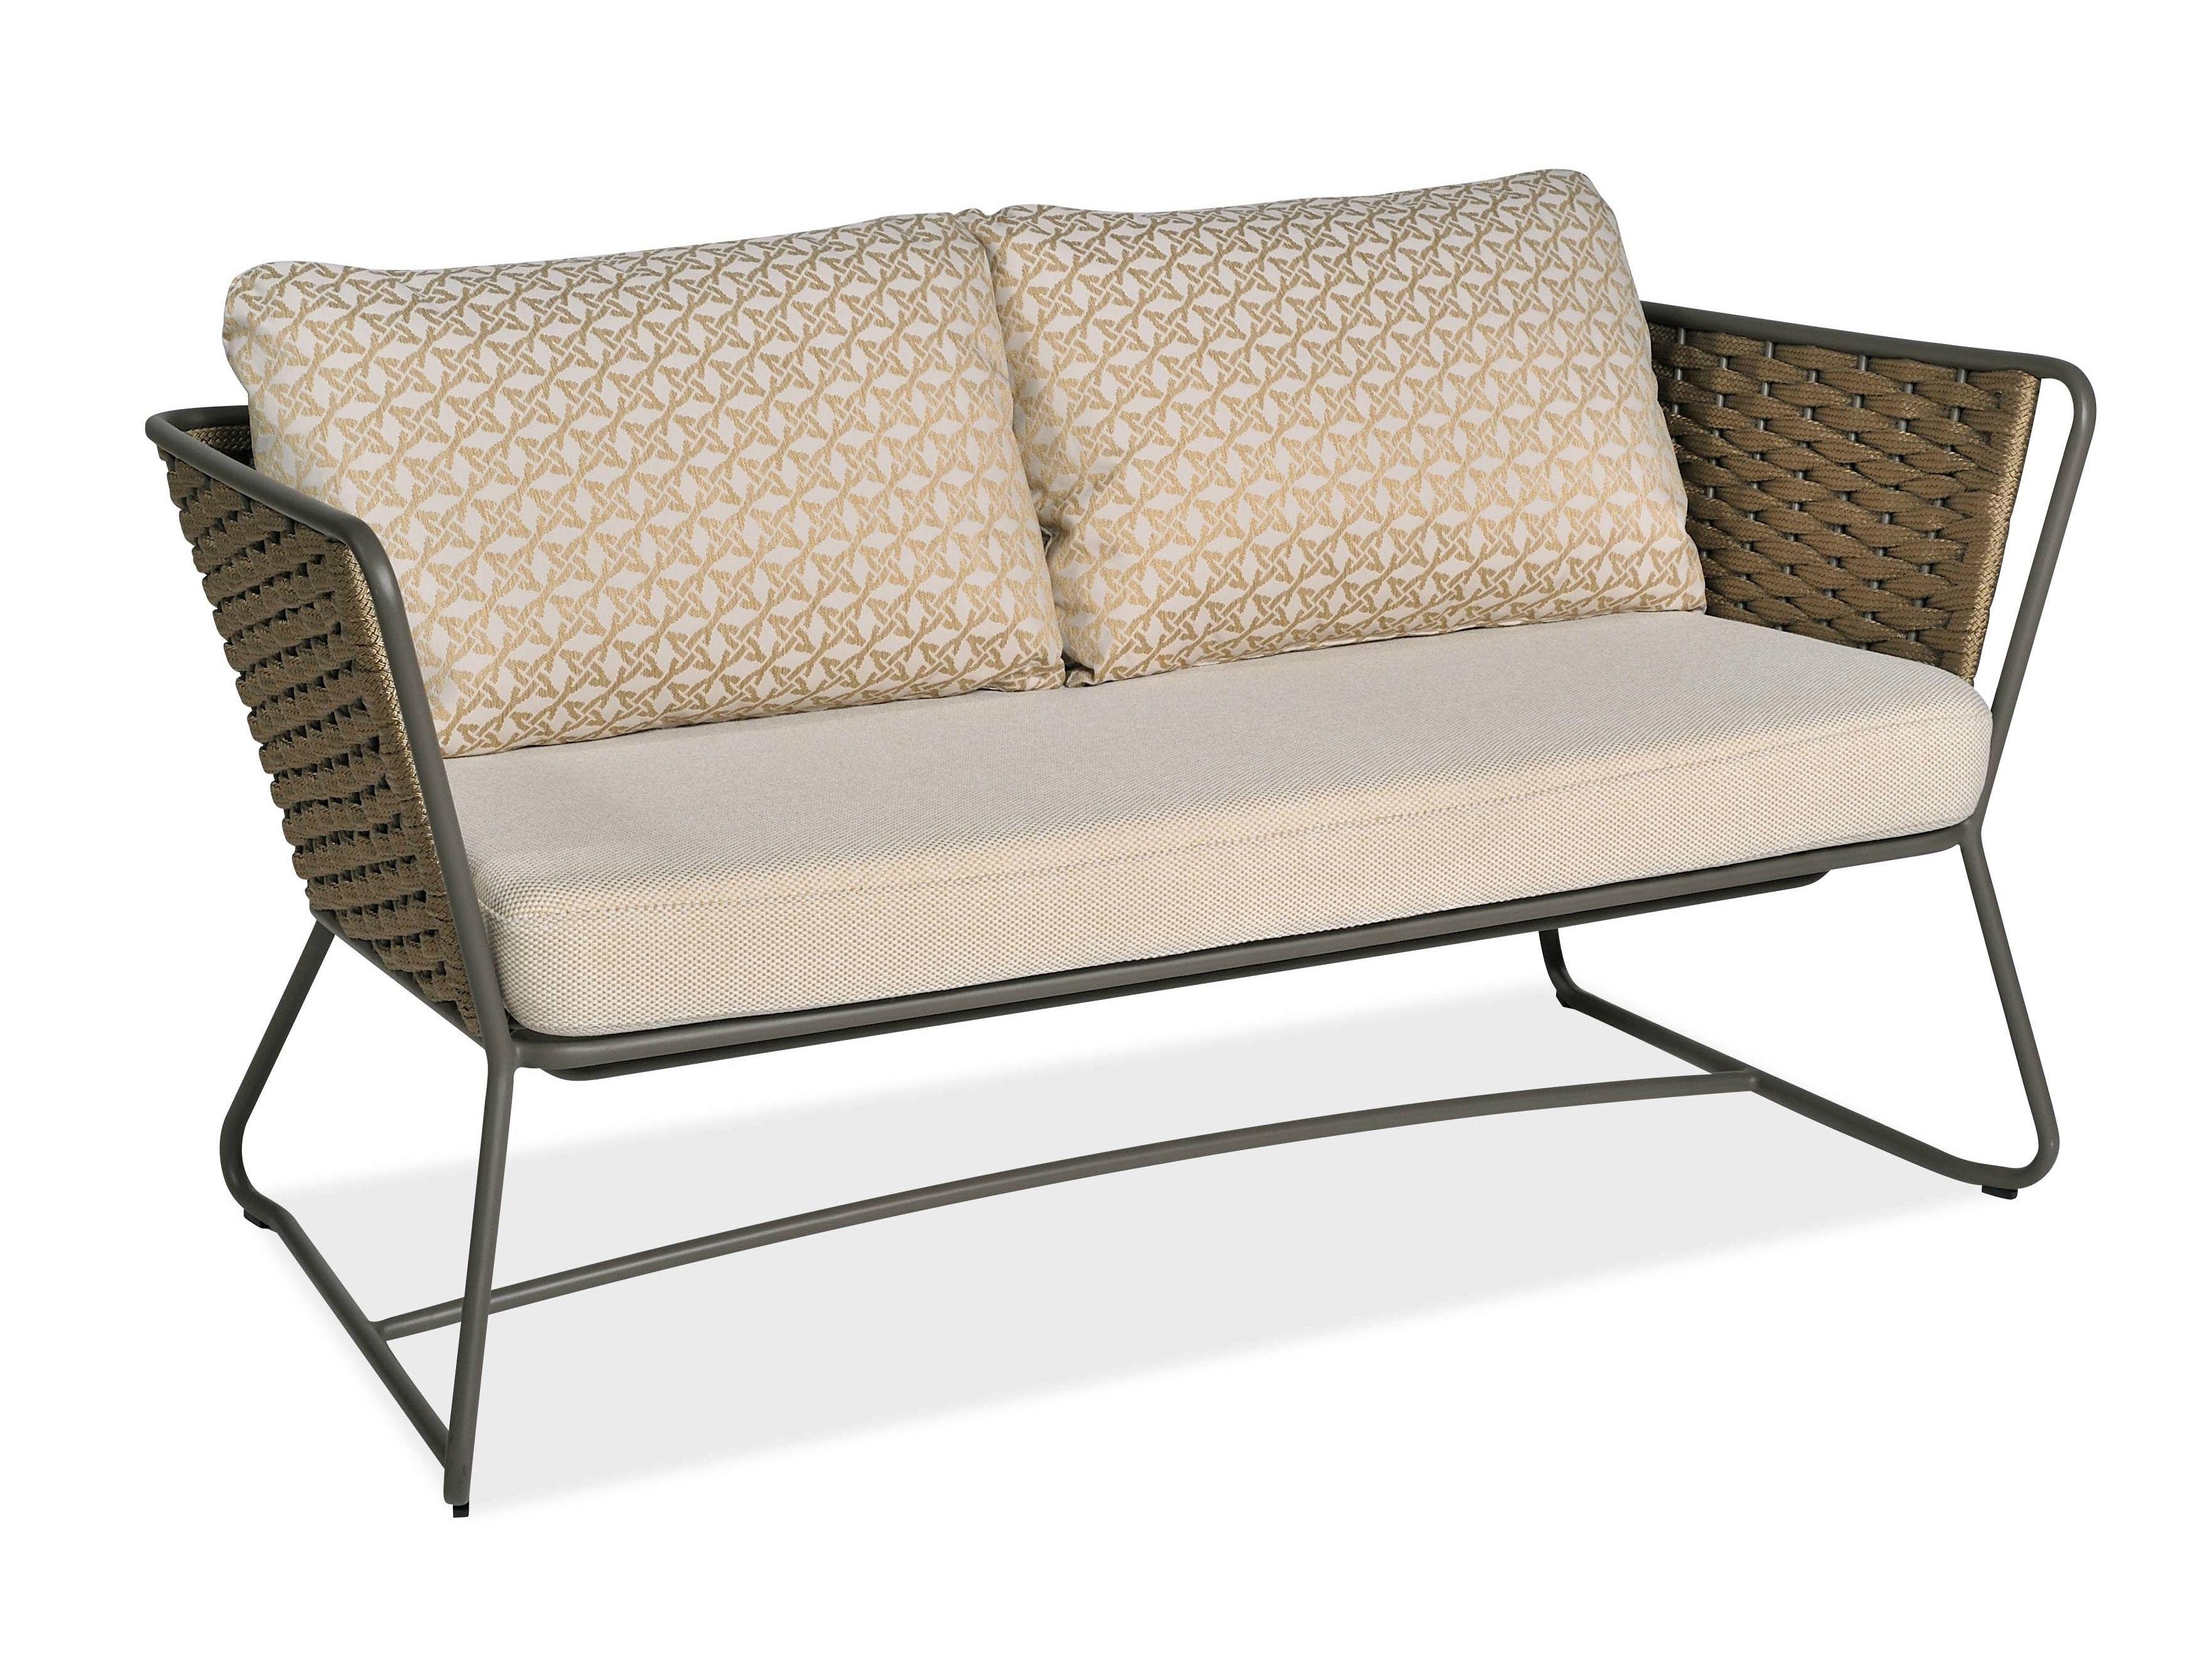 Divani Rattan Ikea Design Interno Ed Esterno Azlitnet